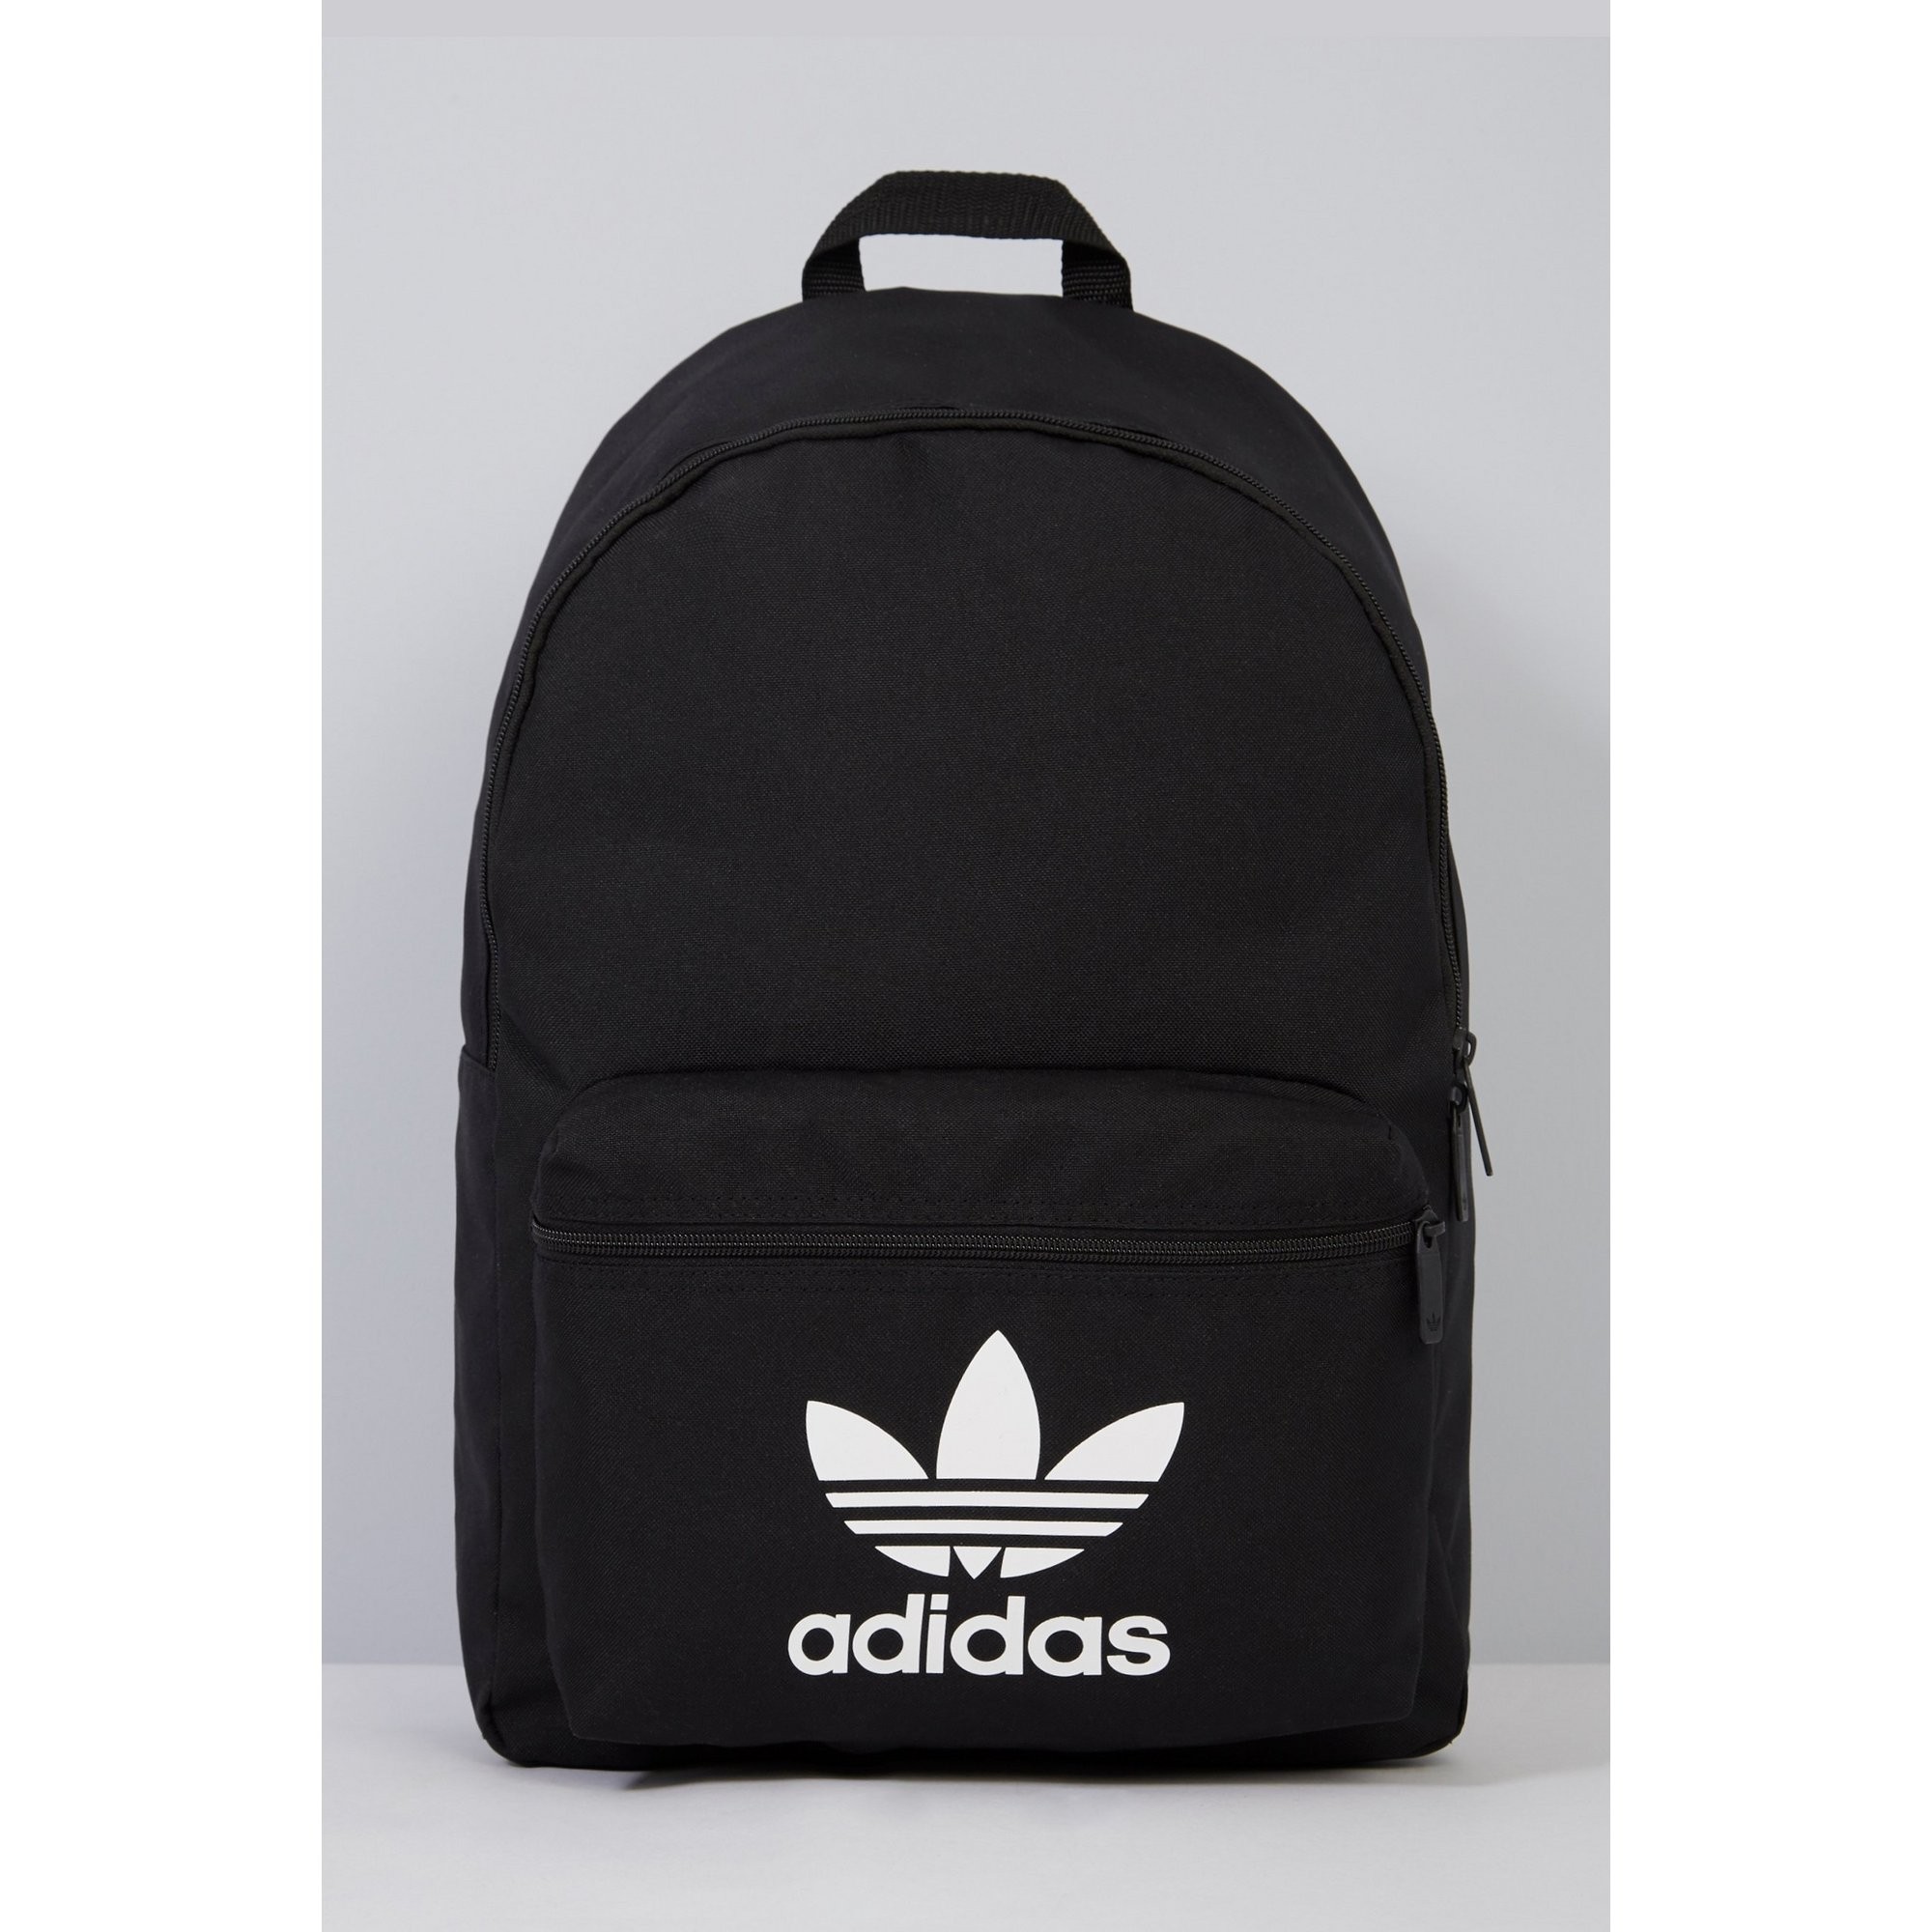 Image of adidas Originals Classic Backpack